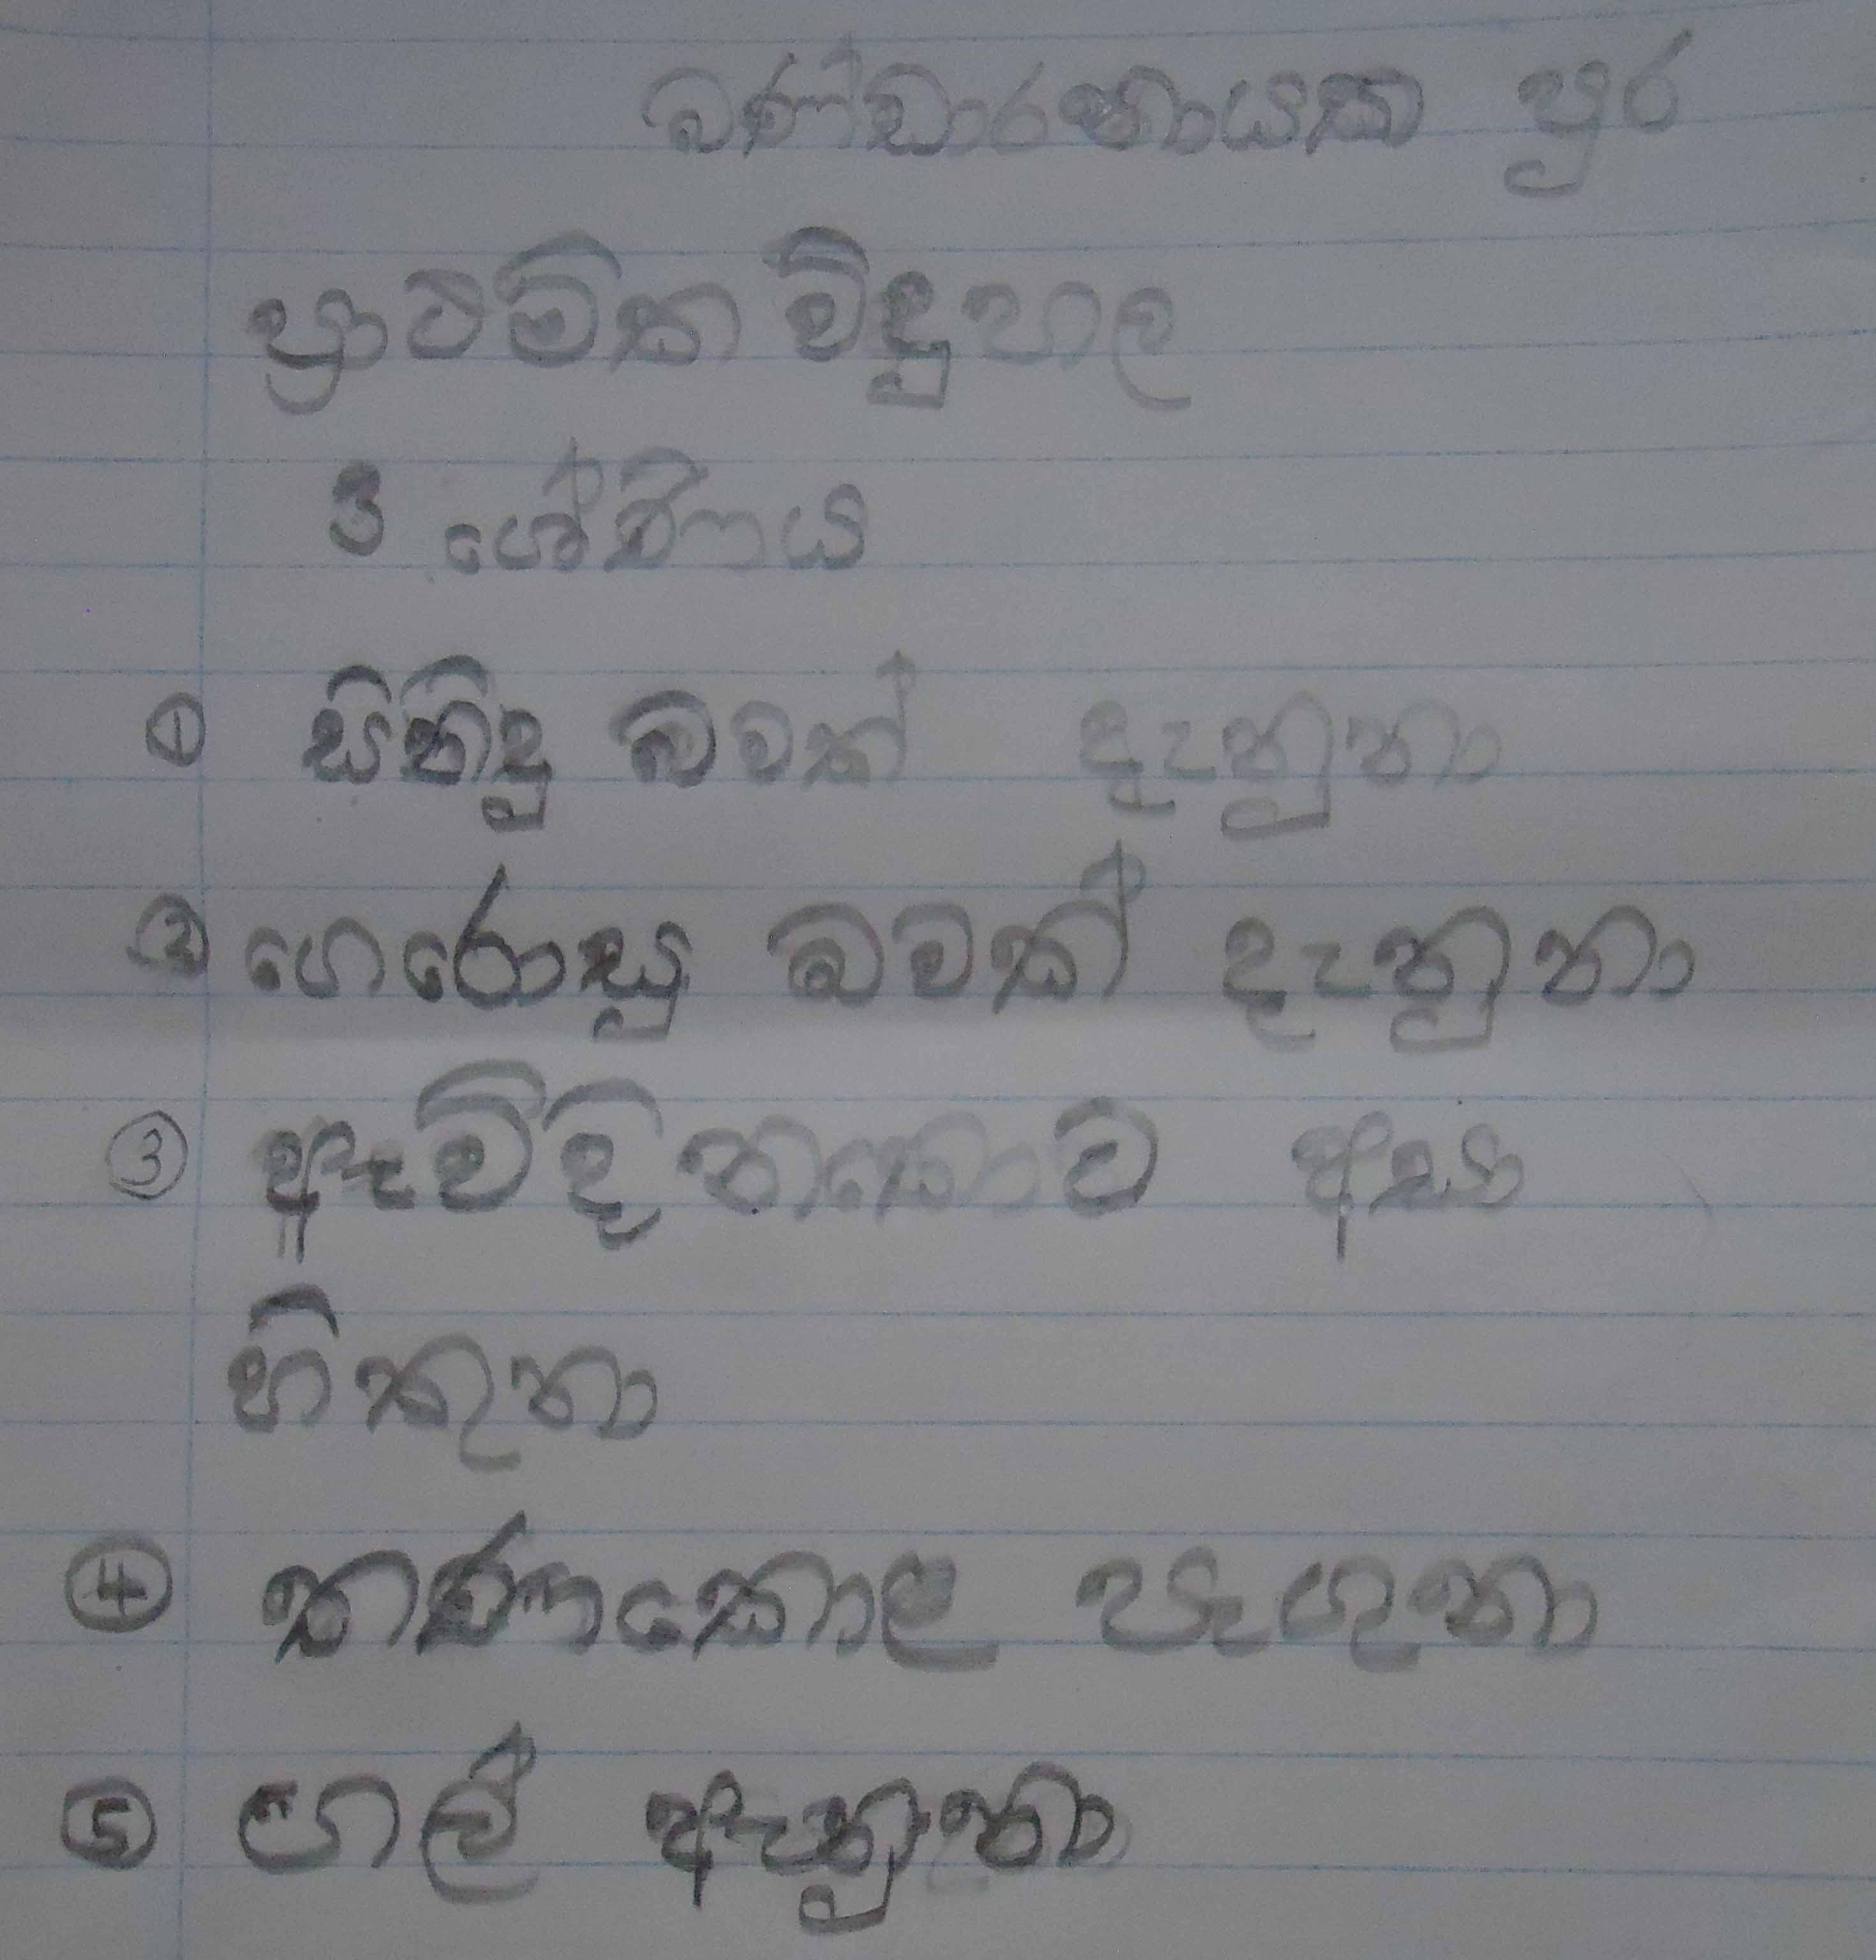 Feedback from students-WP GM Bandaranayakepura Primary School, Kirindiwela (5)